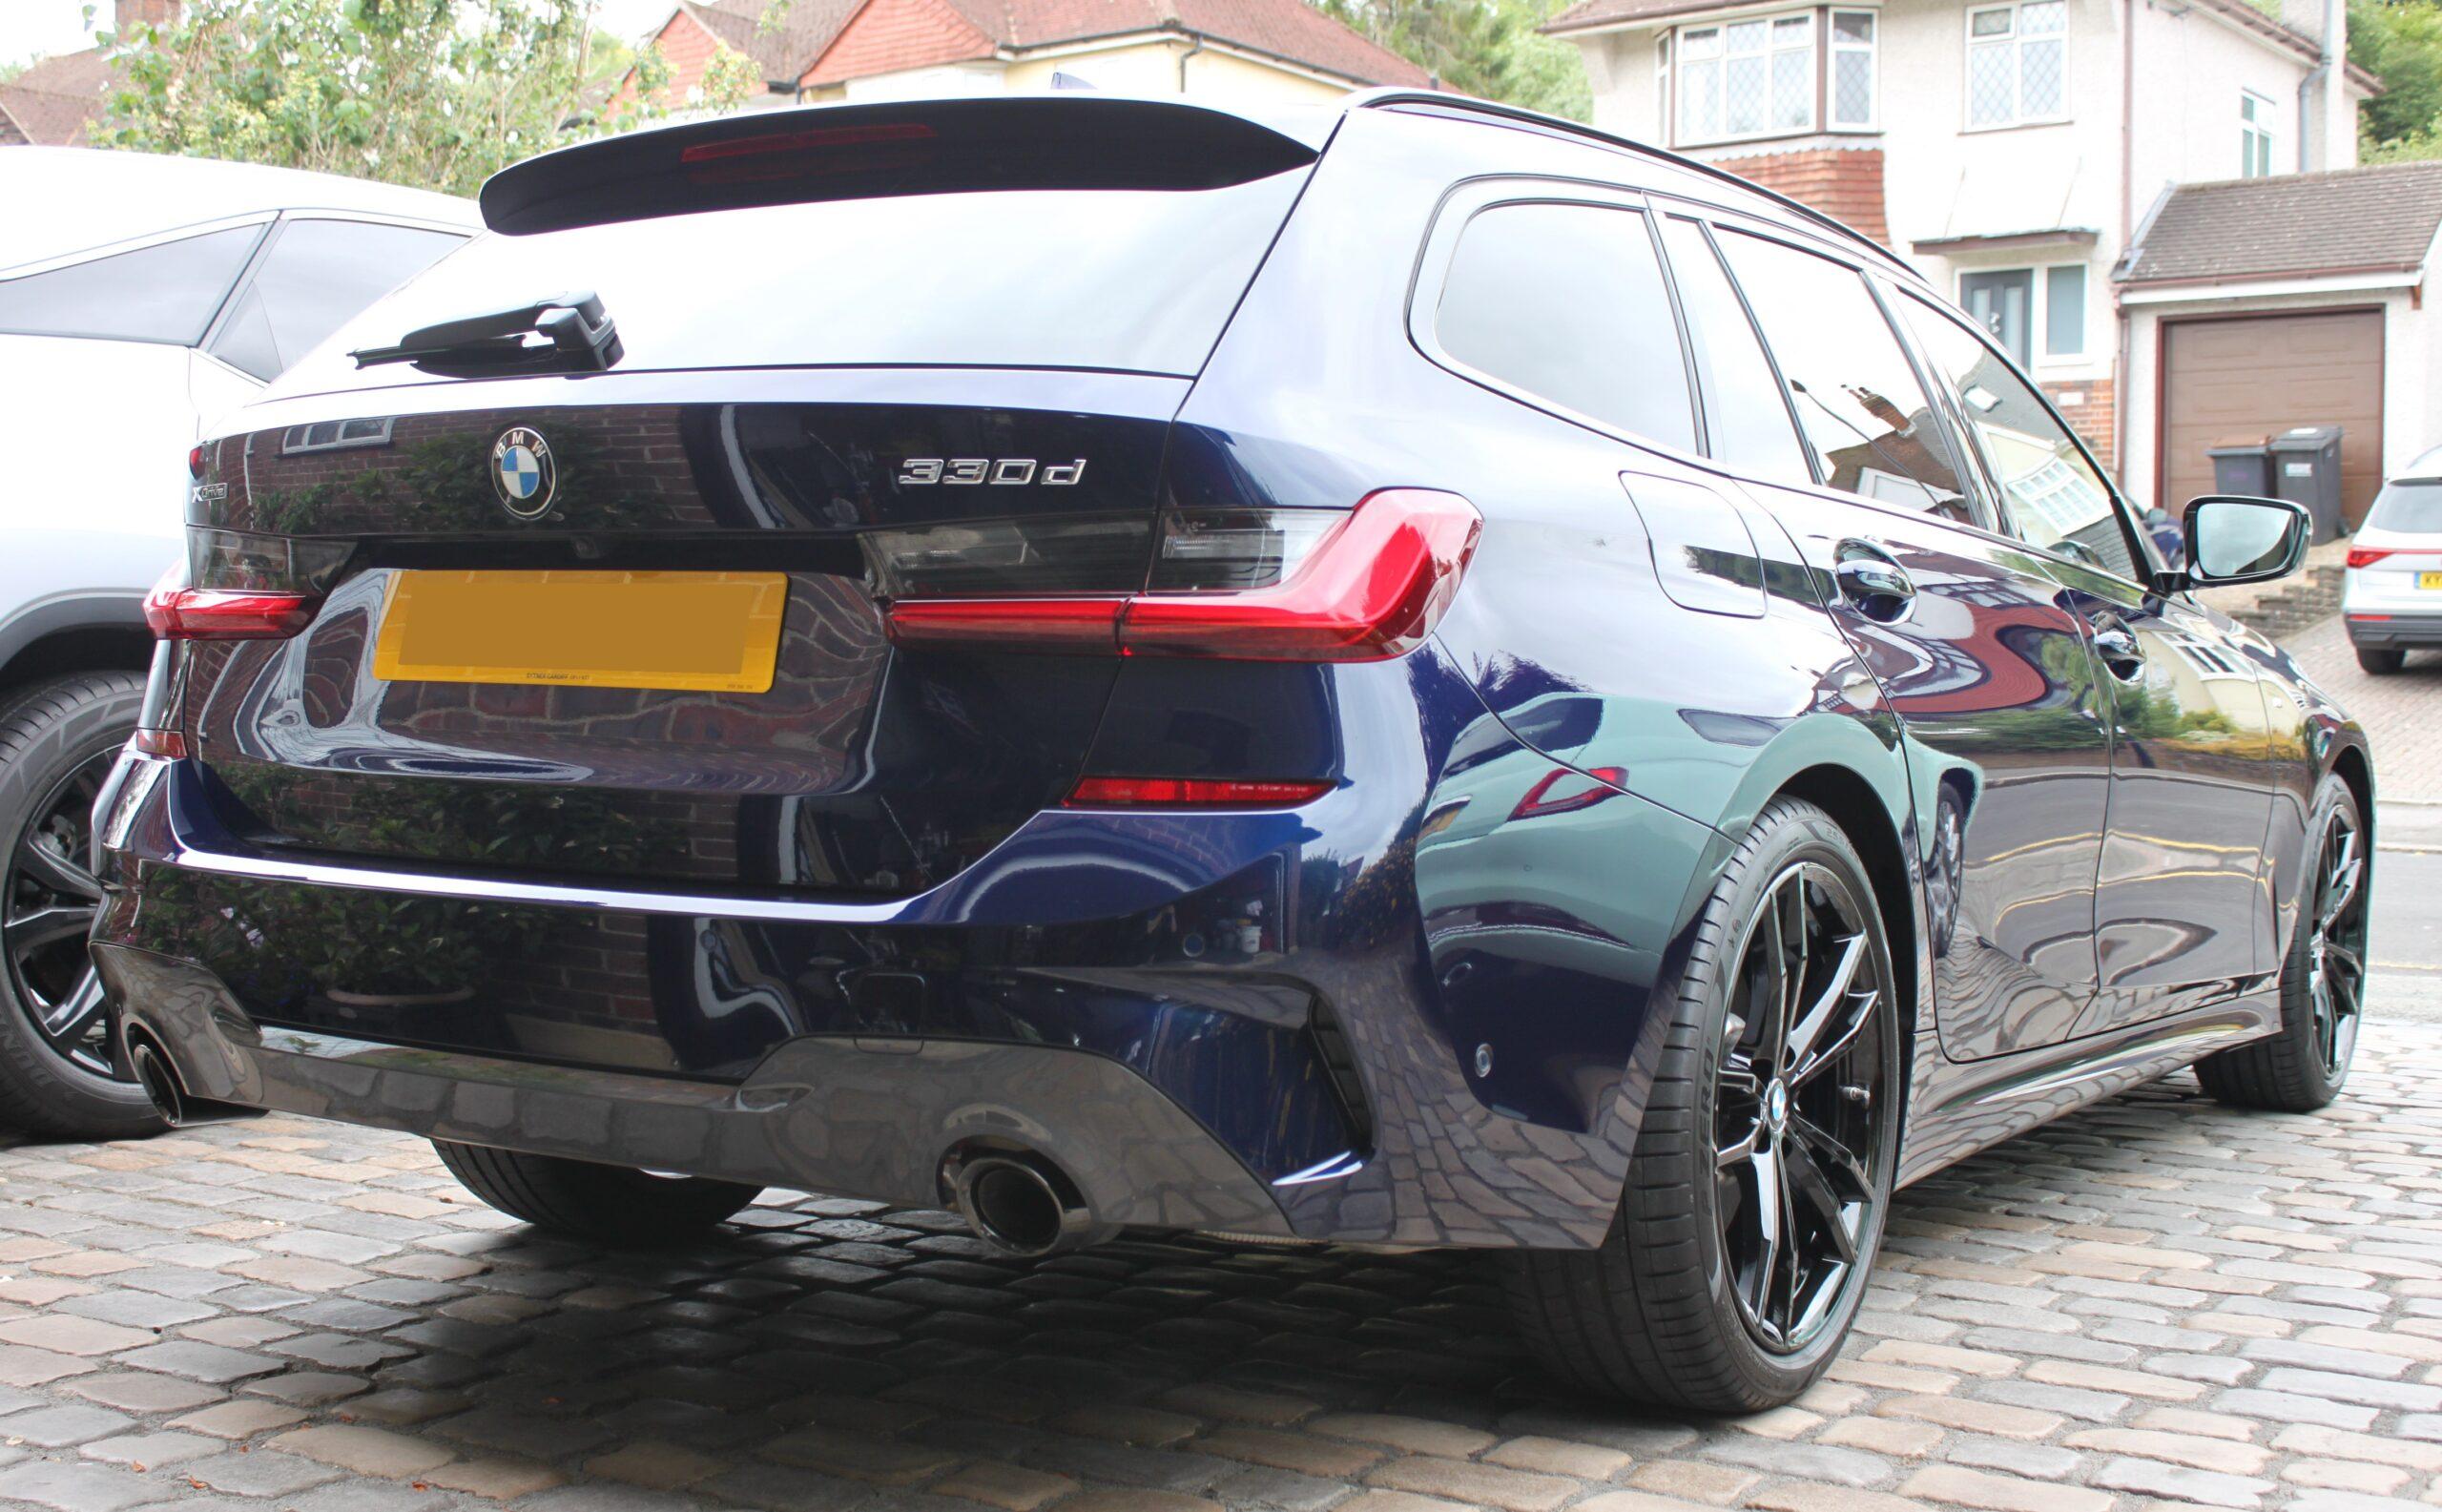 BMW 330D New car detail